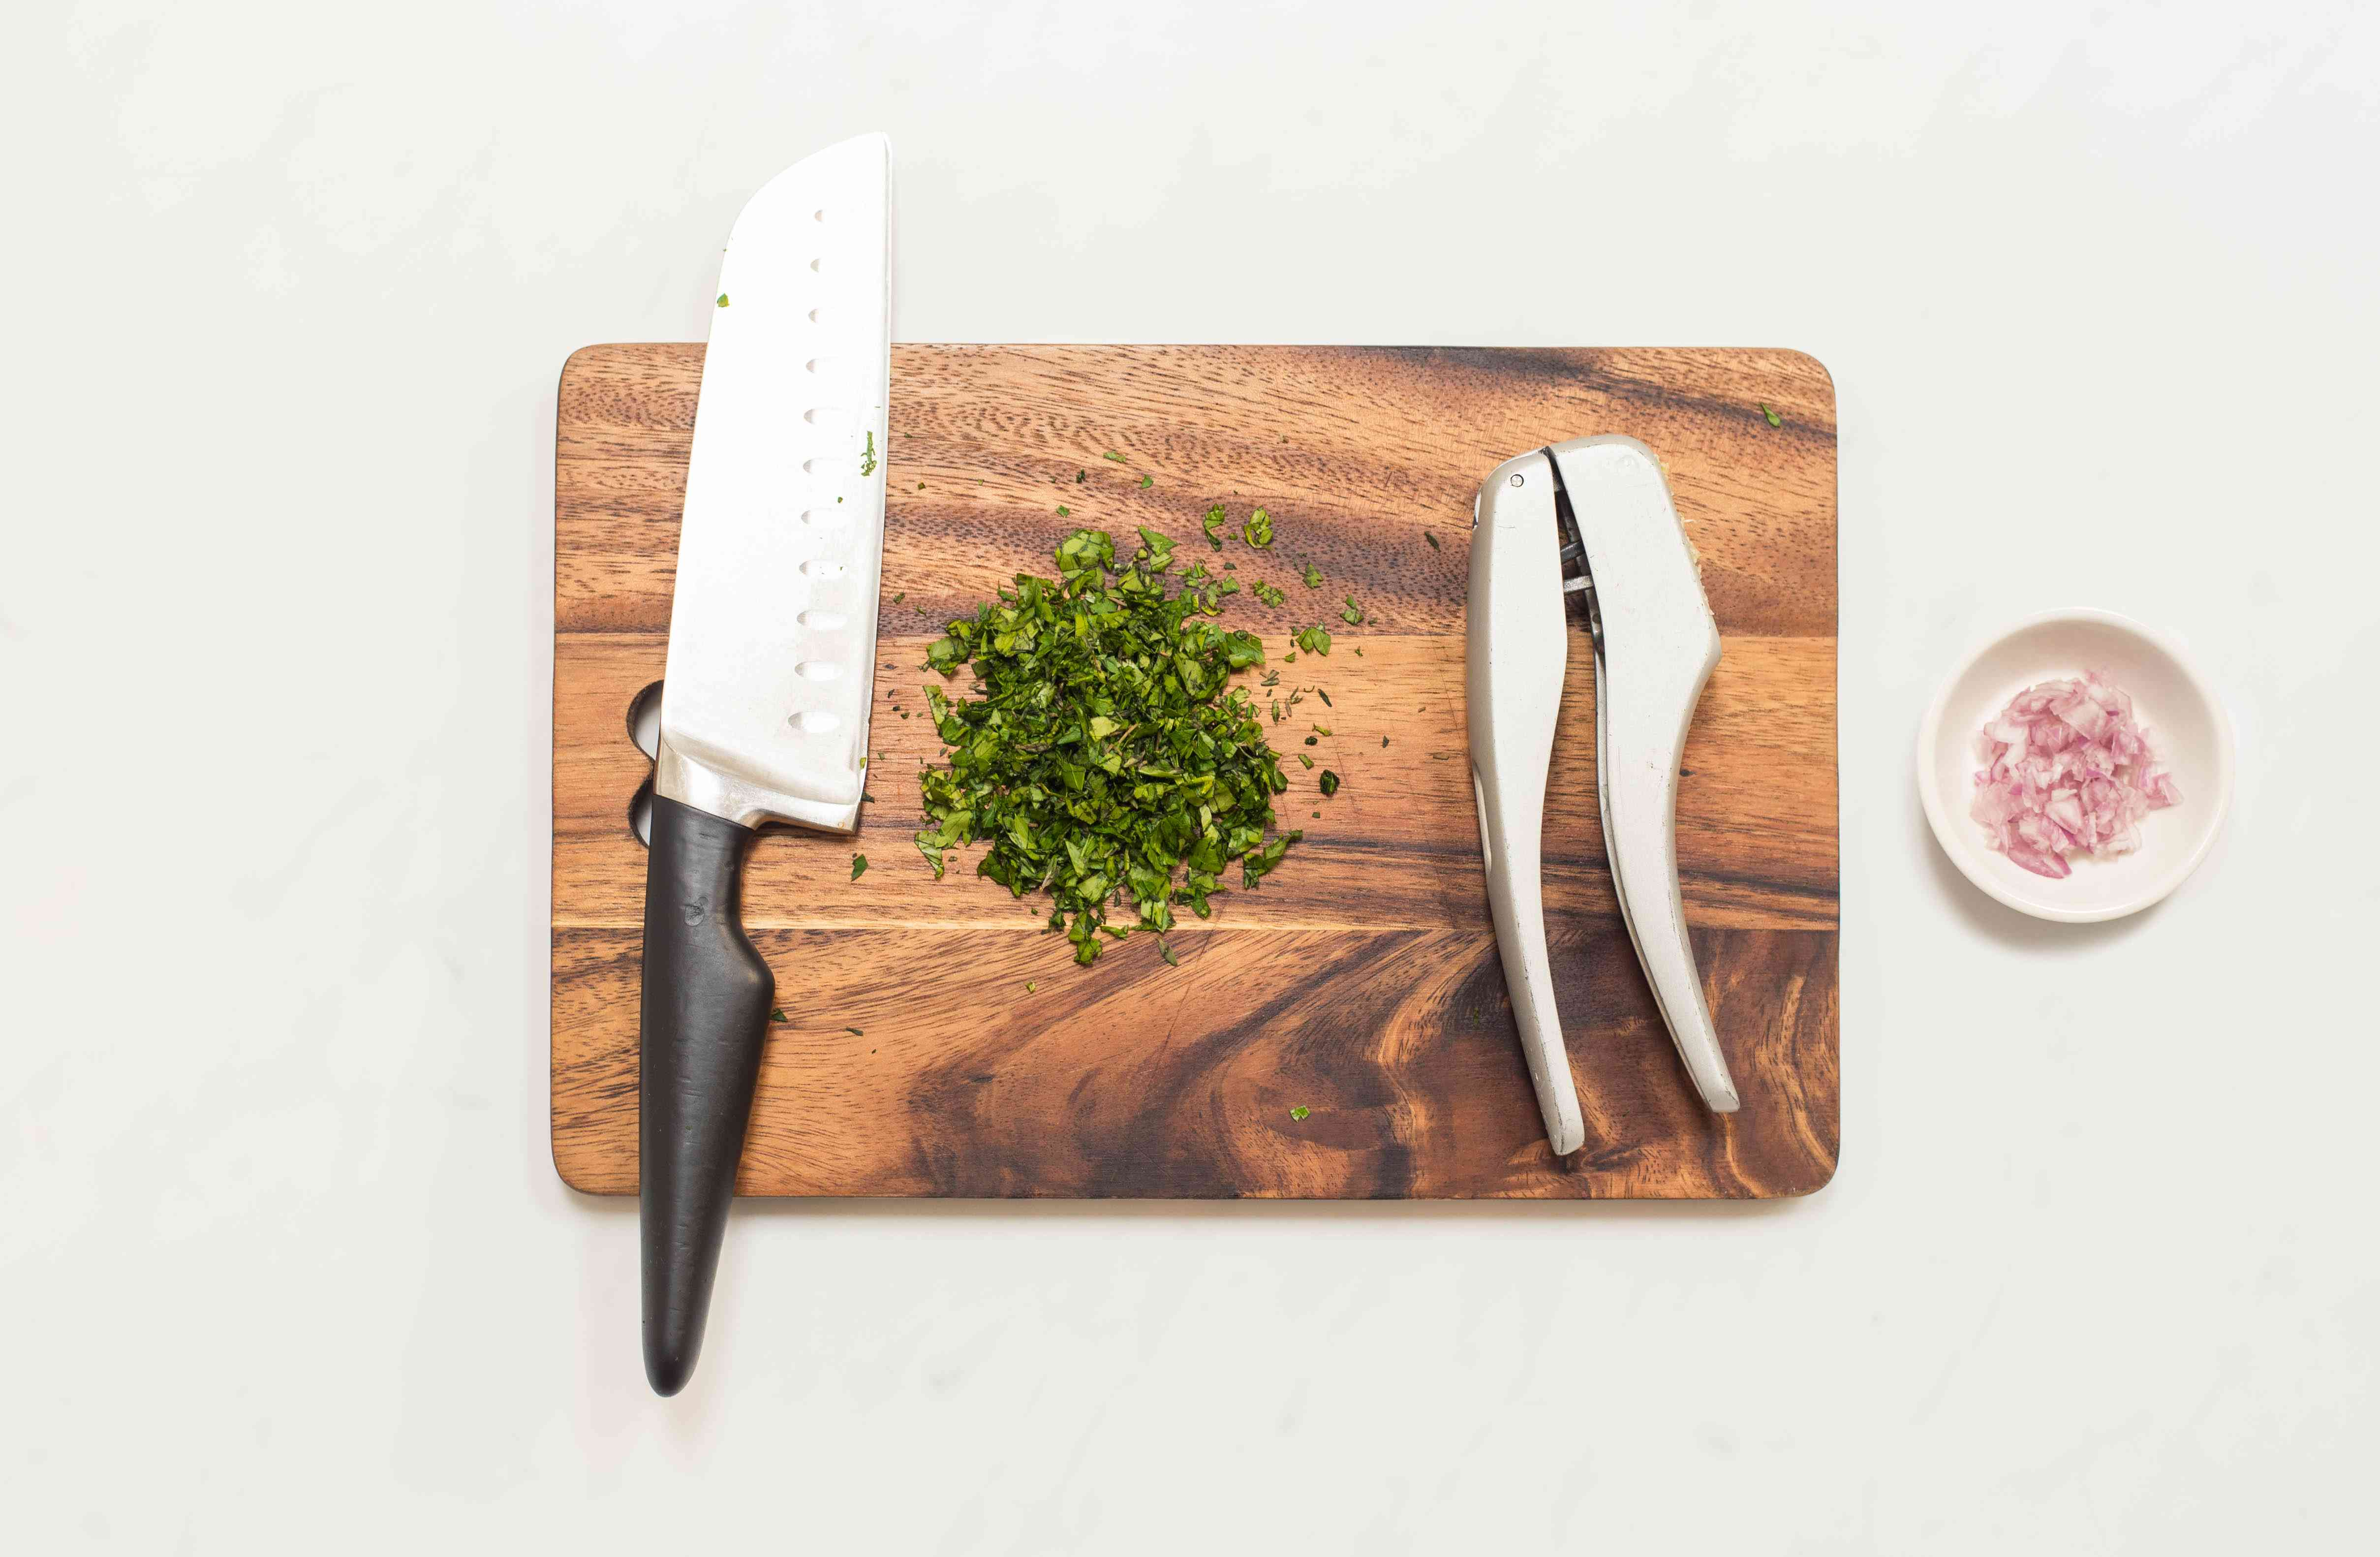 mince parsley, thyme, cilantro